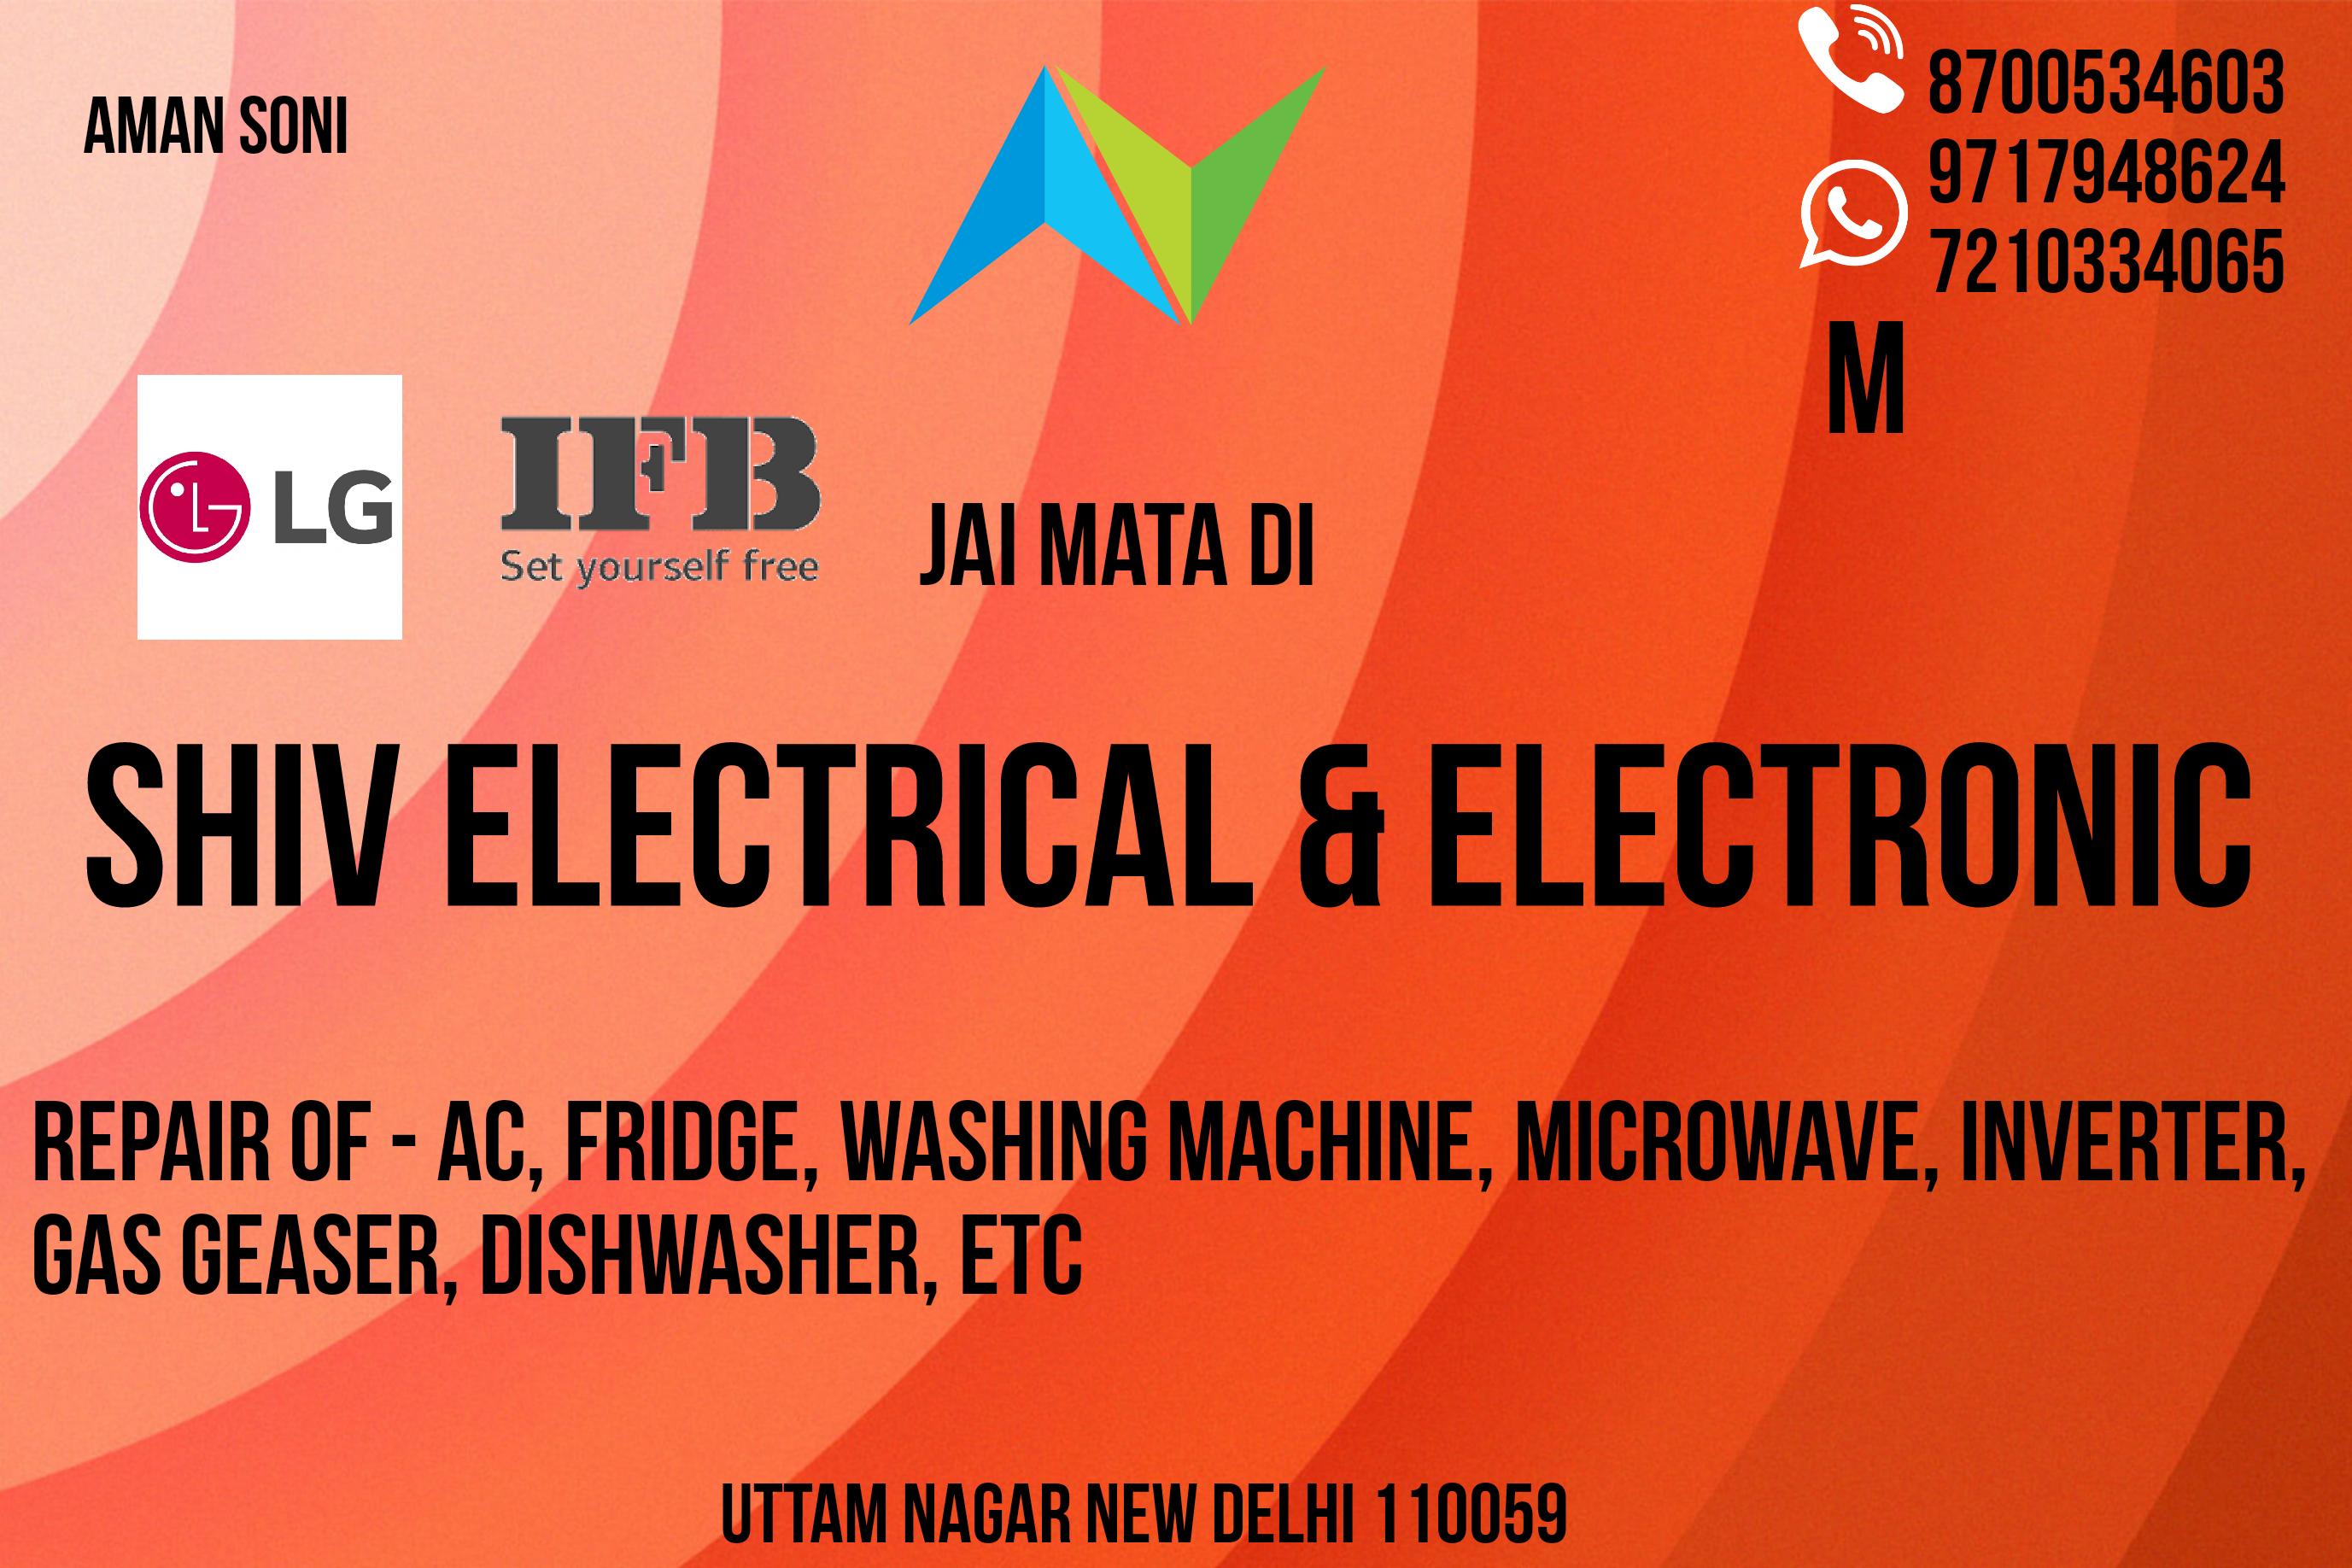 Shiv electrical